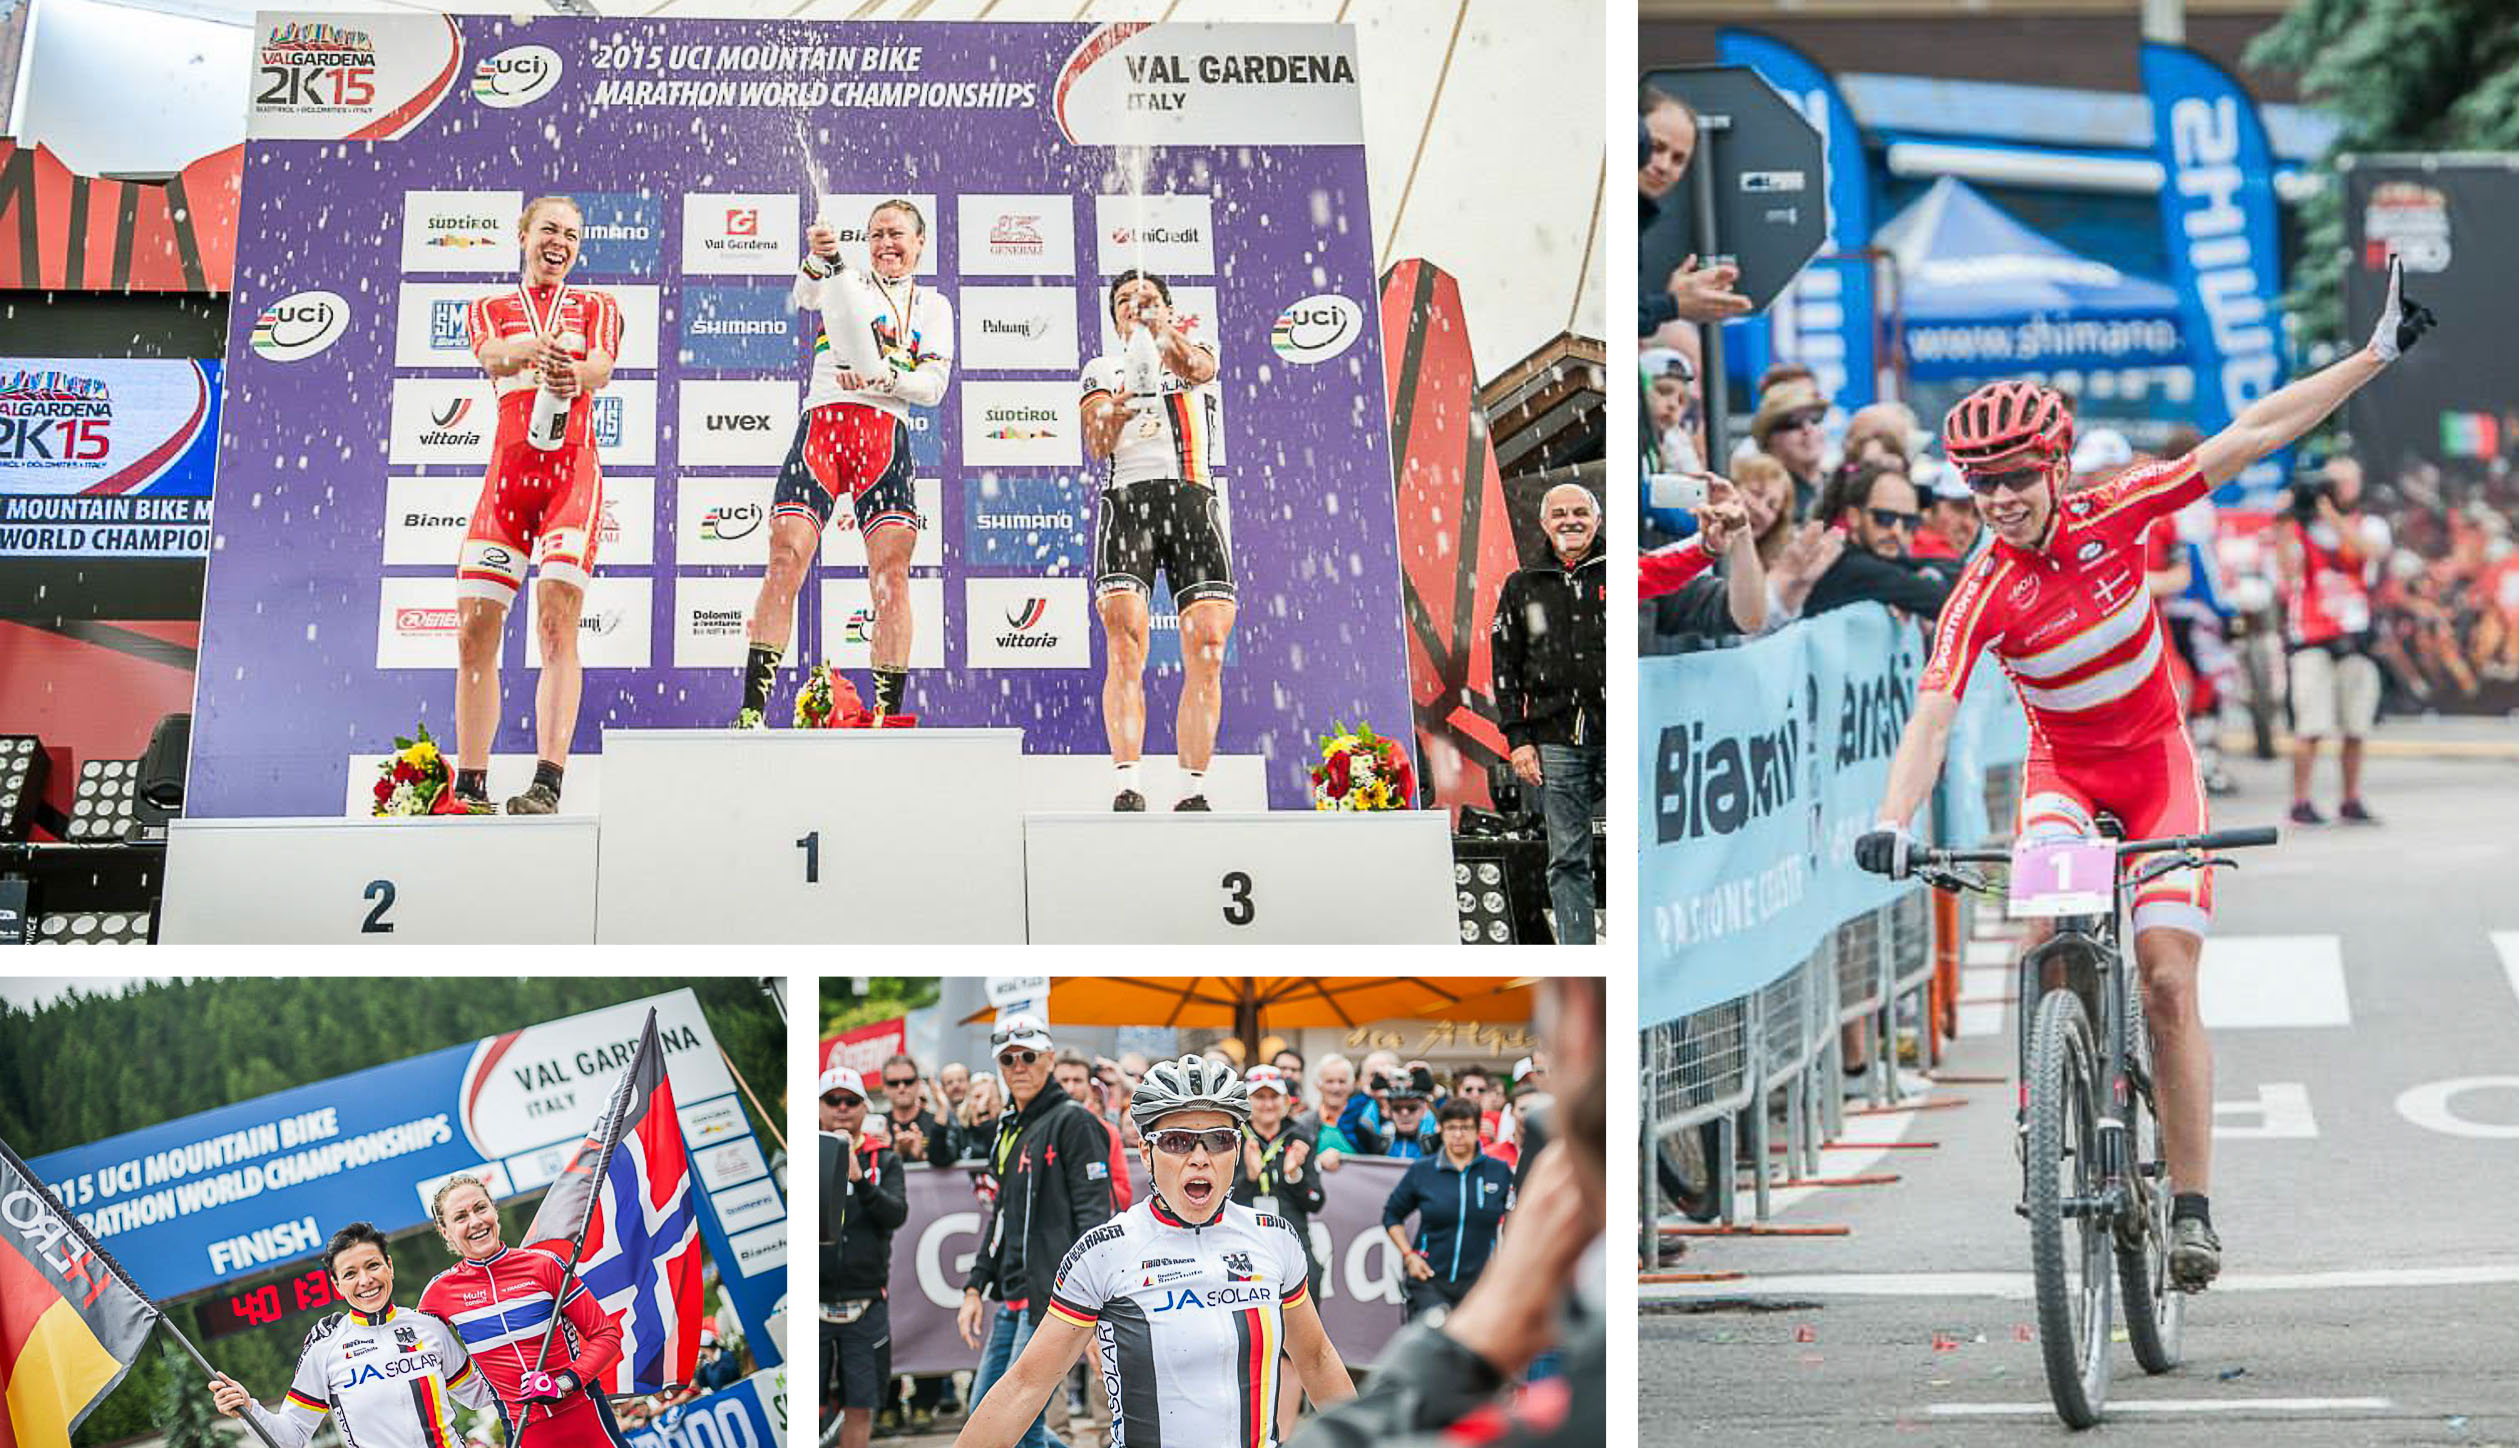 3-Championnat_Monde_Marathon_2015_Val_Gardena_Copyright_Sella_Ronda_Hero-1-2